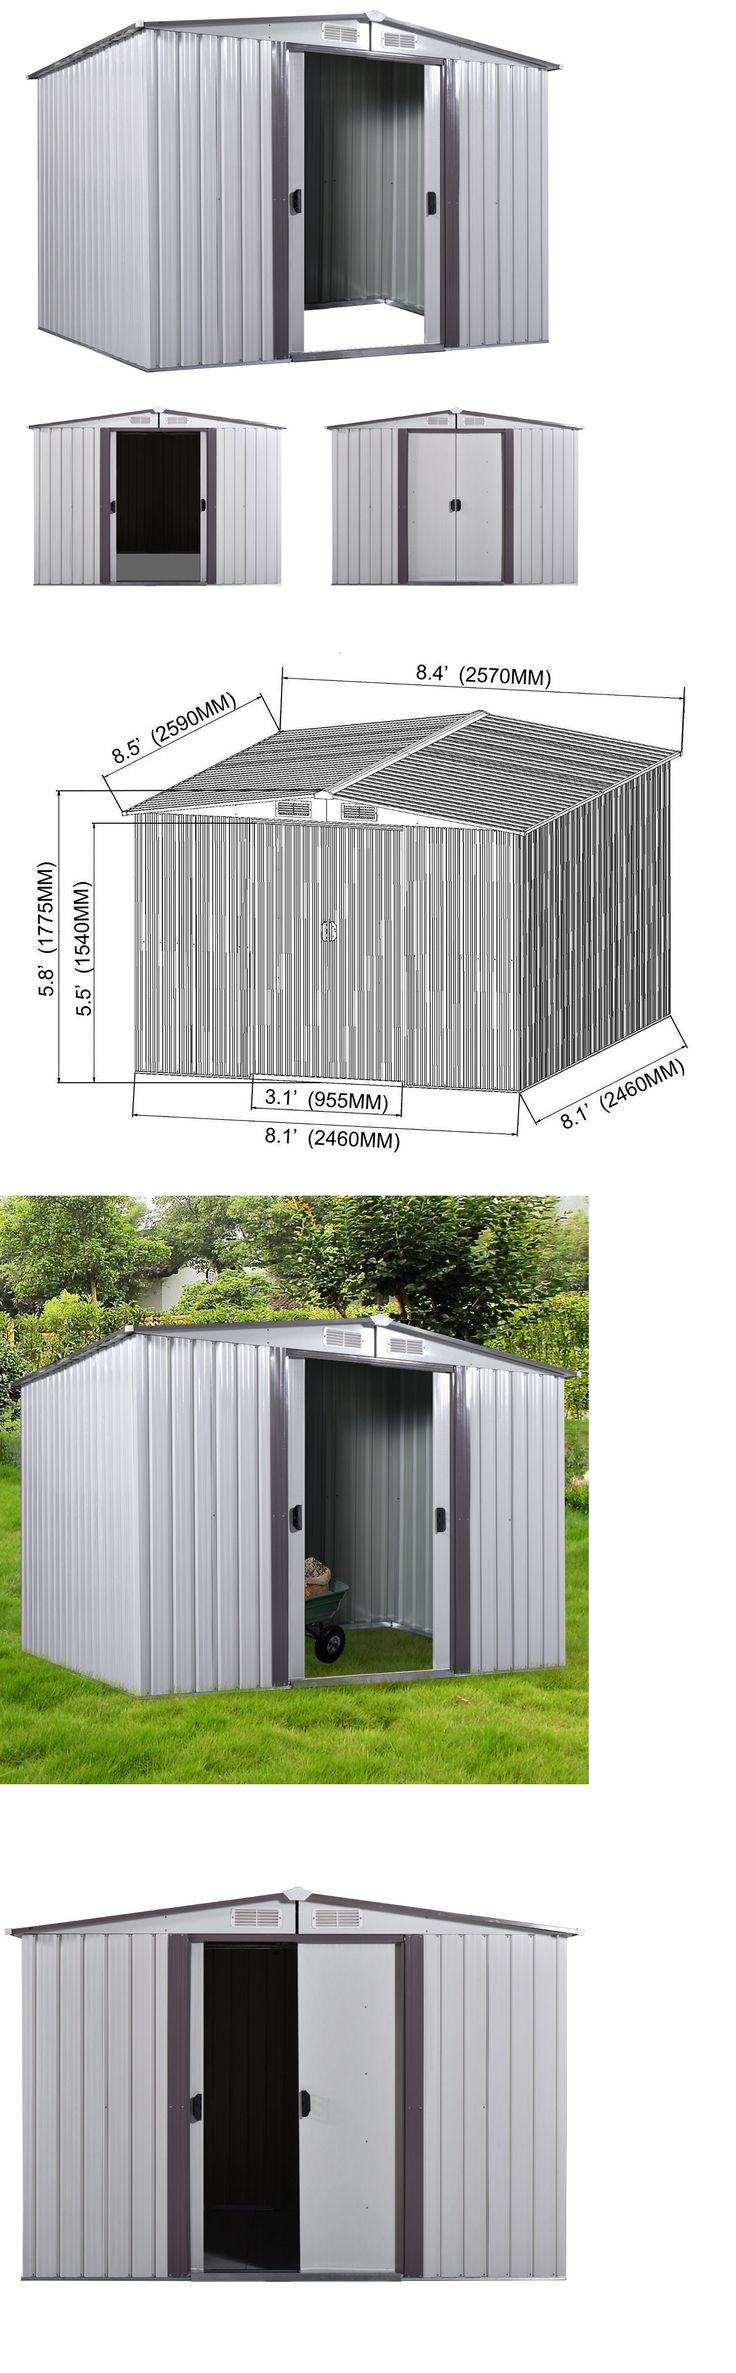 Garden and Storage Sheds 139956: 8 X 8 Shed Storage Kit Metal Garden Building Doors Steel Outdoor Diy Backyard -> BUY IT NOW ONLY: $339.99 on eBay!